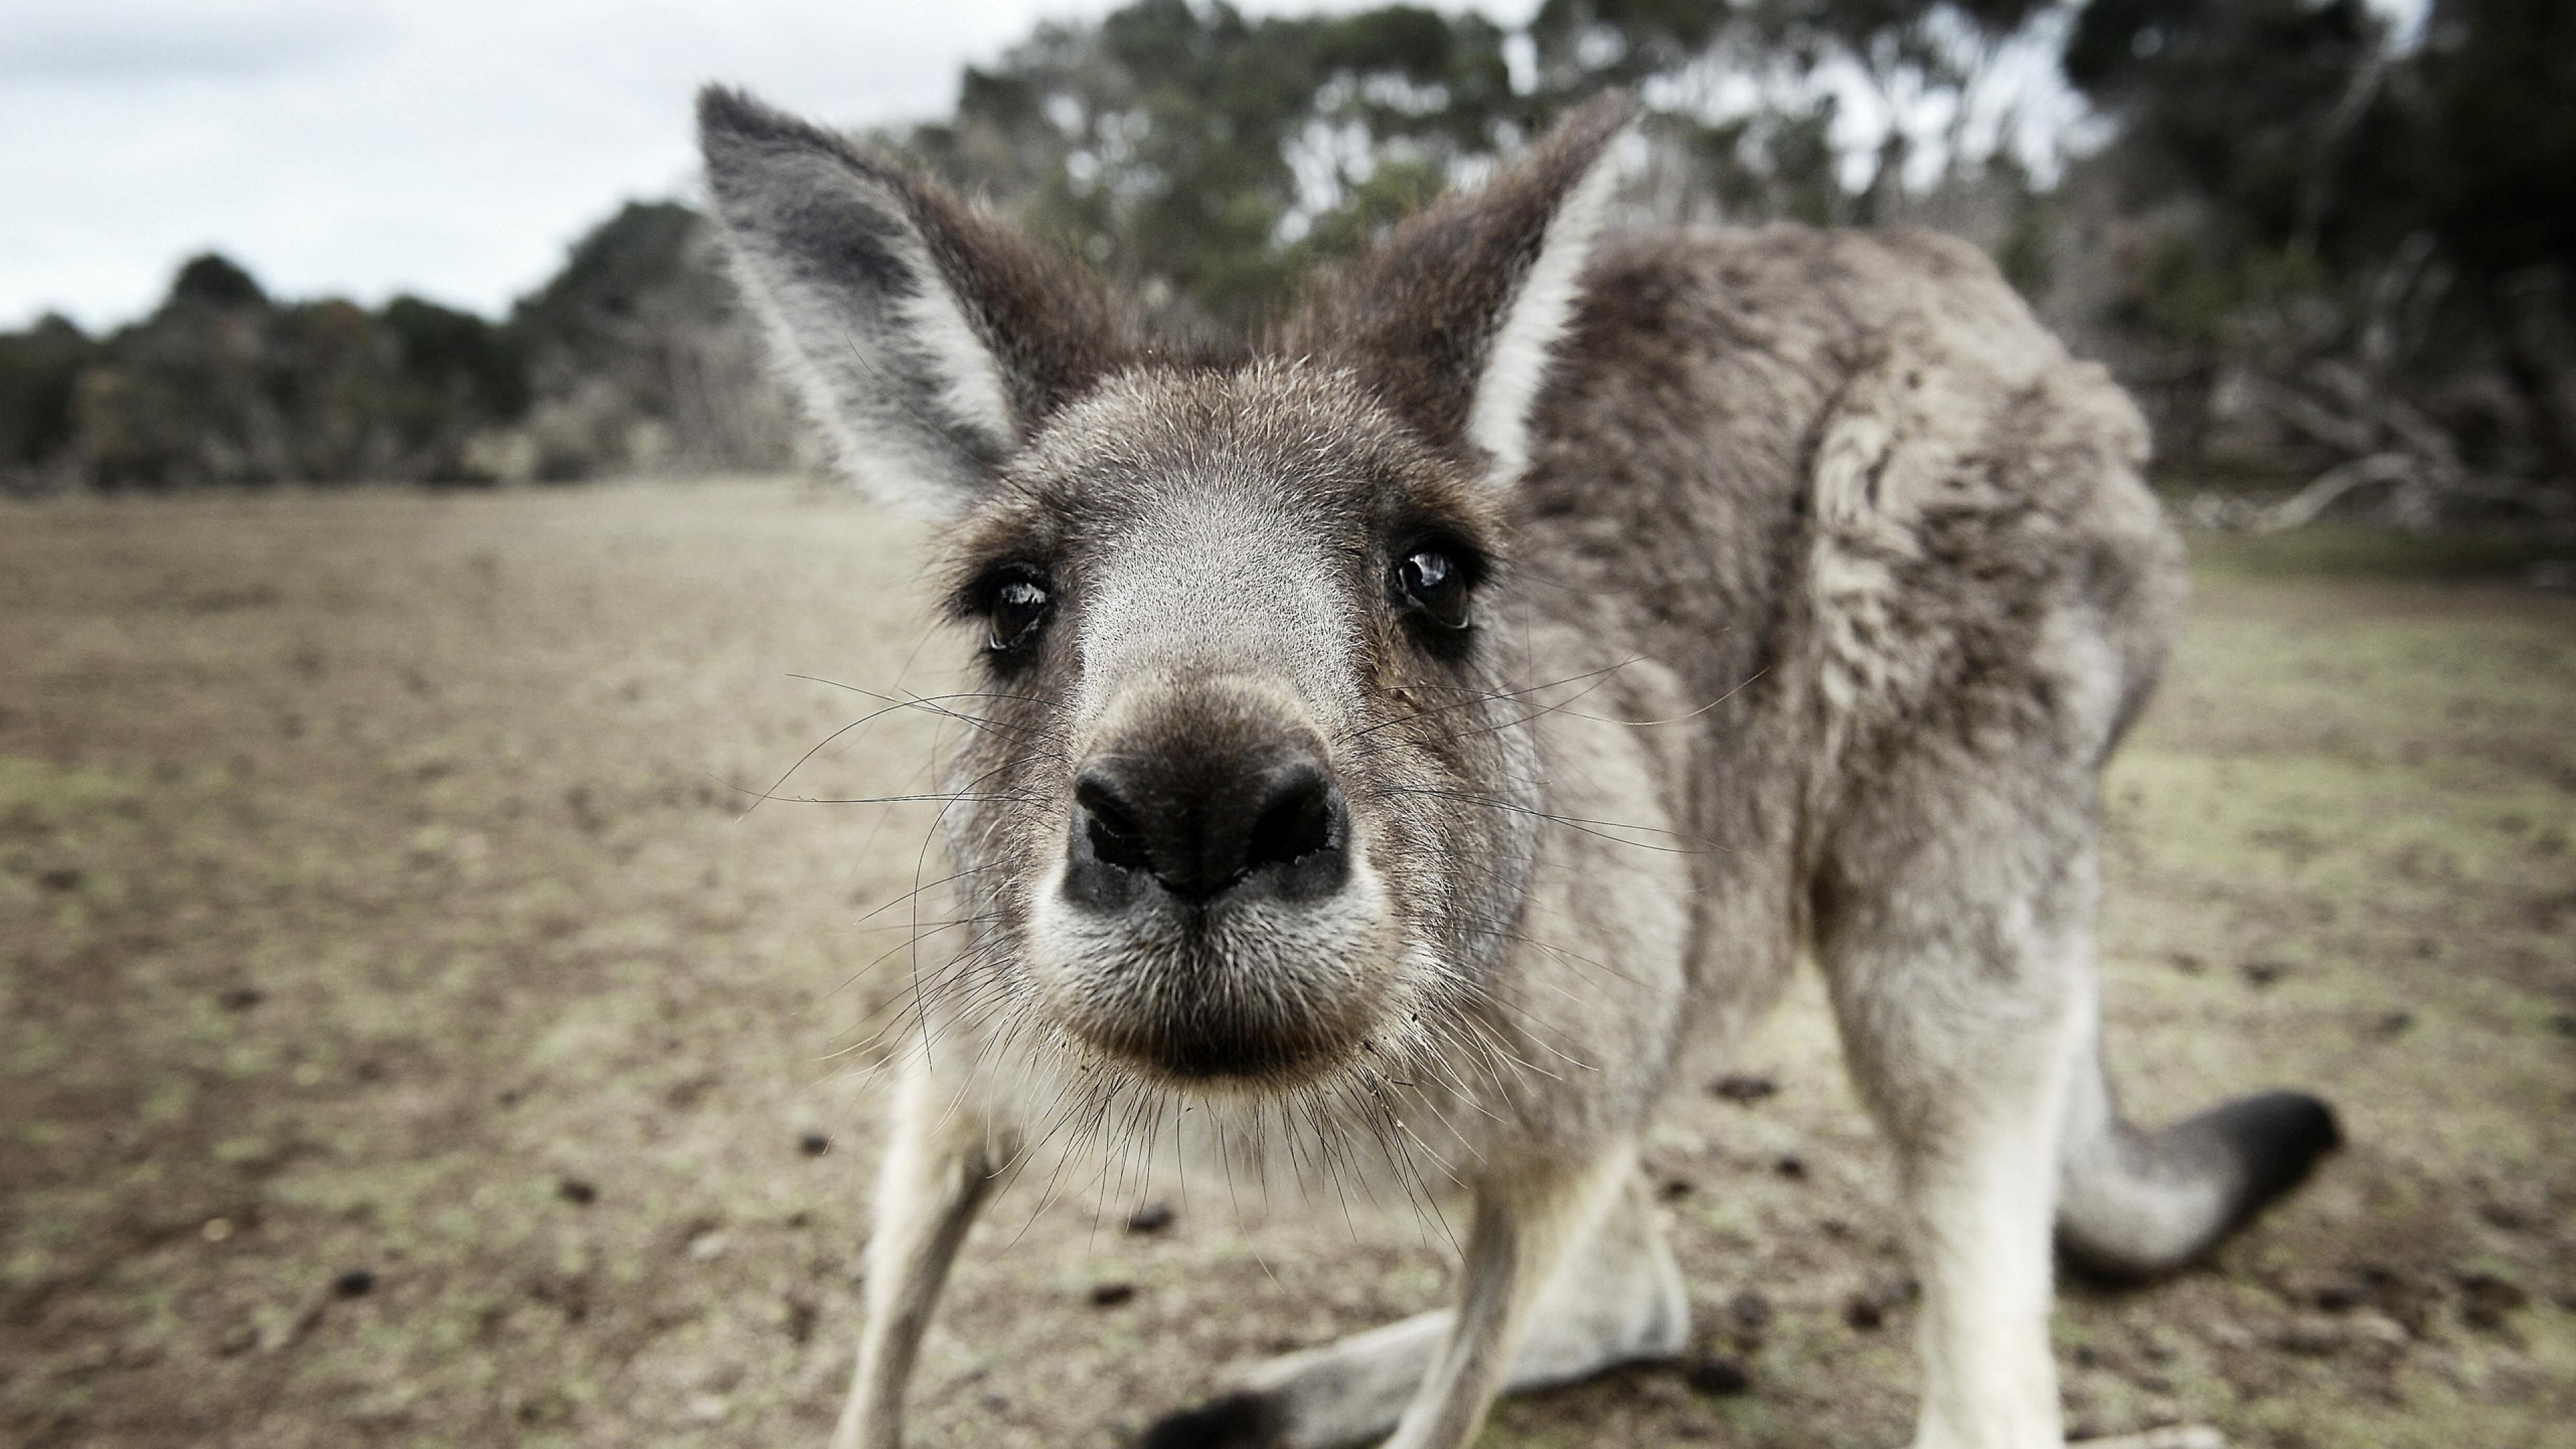 kangaroo funny 4k 1542237752 - Kangaroo Funny 4k - kangaroo wallpapers, funny wallpapers, animals wallpapers